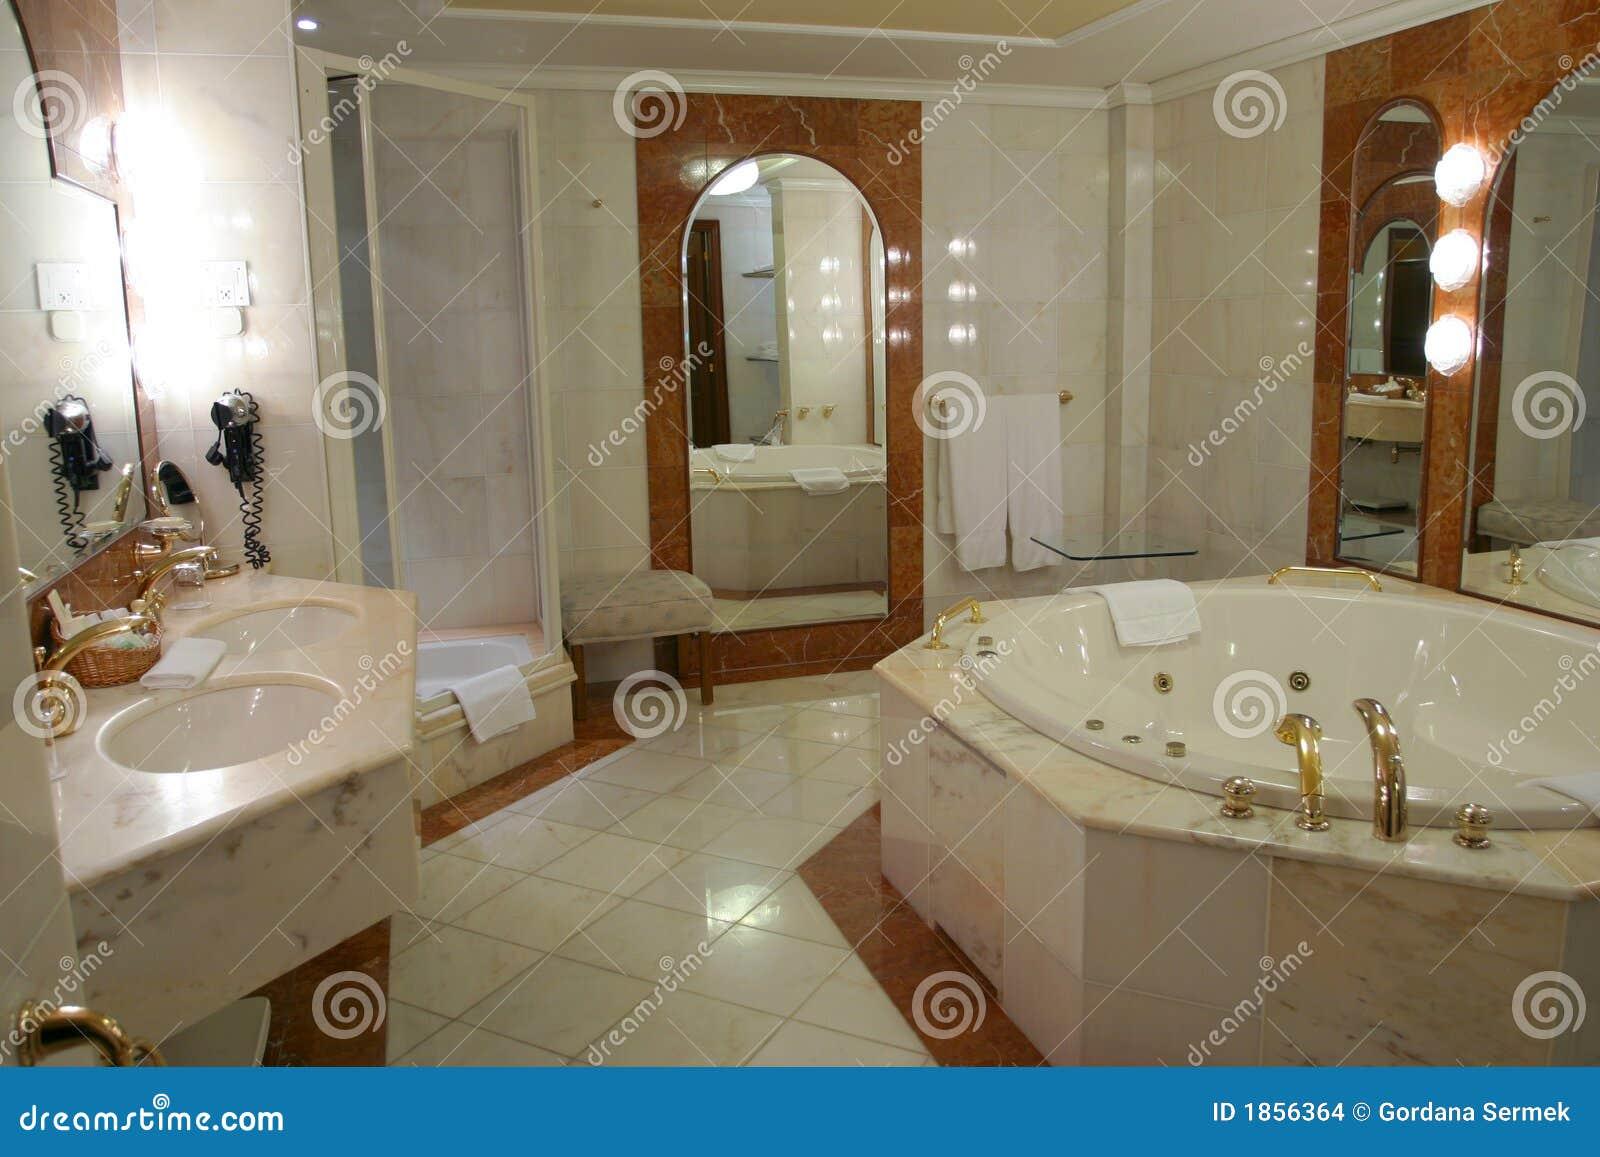 Salle de bains moderne et spacieuse images stock image - Photo de salle de bain moderne ...